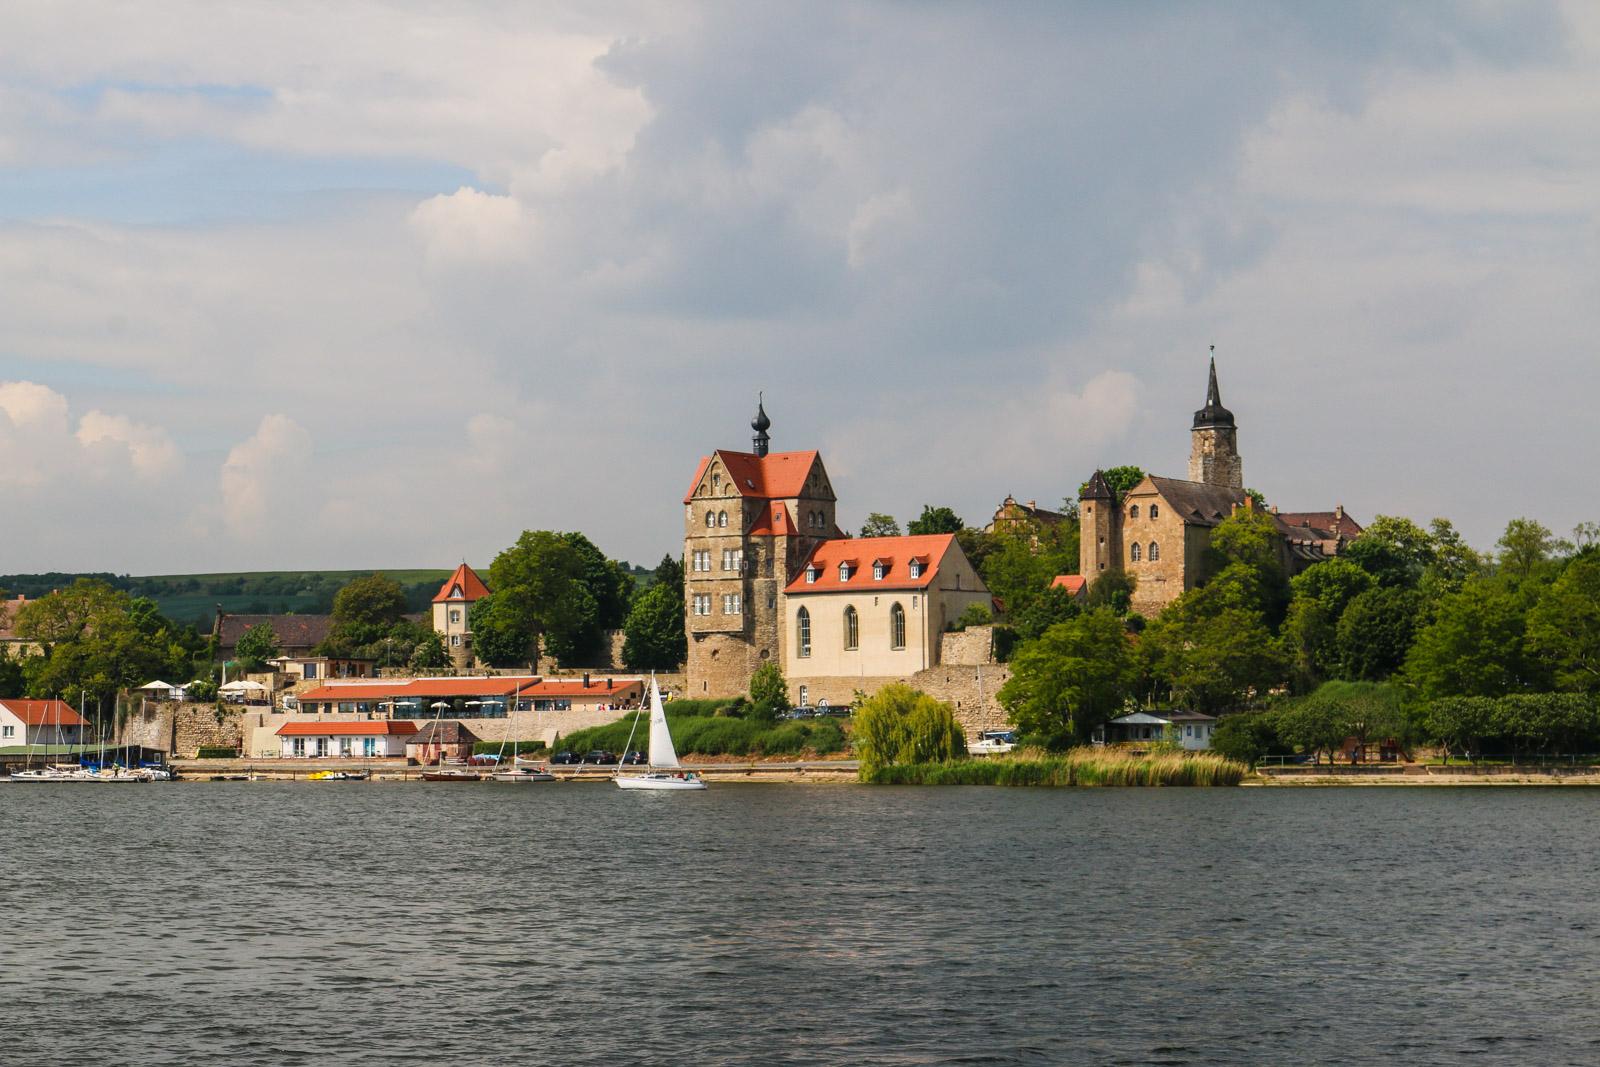 This is Seeburg castle near my hometown Eisleben, Germany. Germany is beautiful, isn't it?